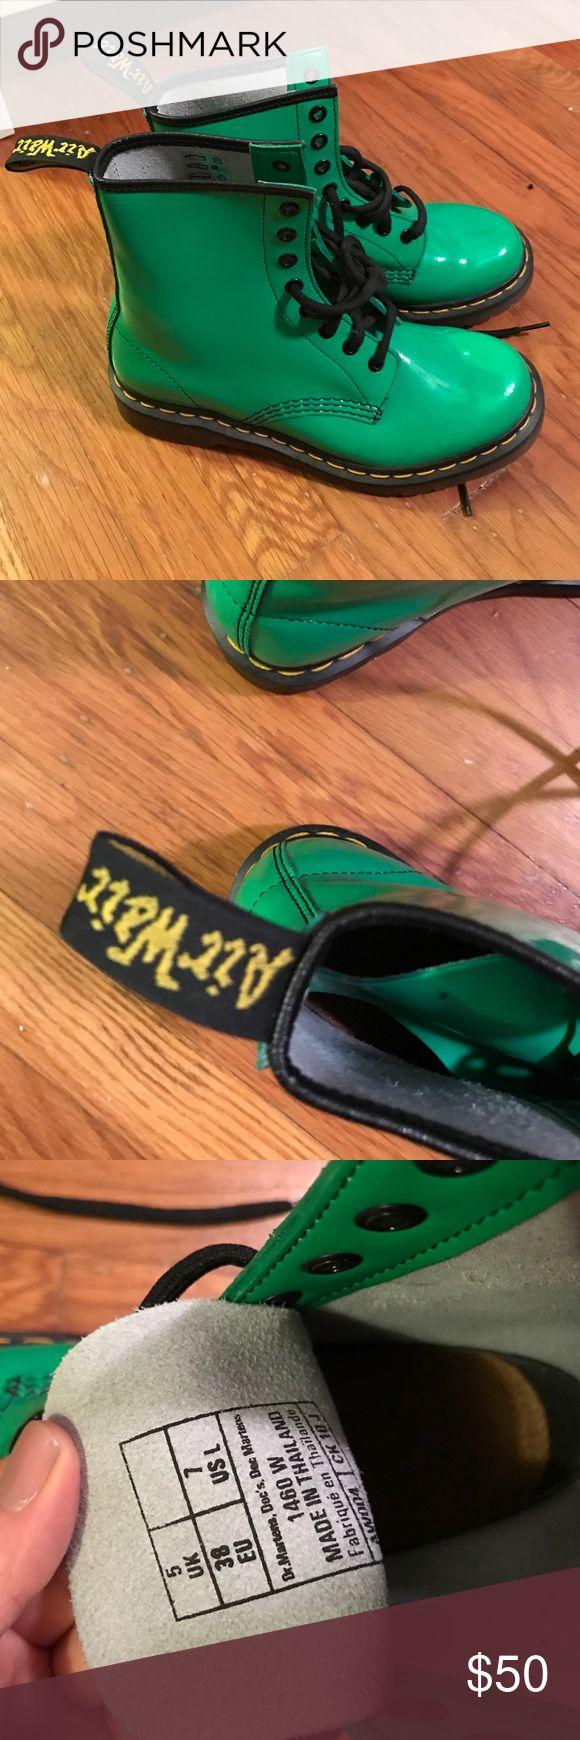 Vintage vegan bright green Doc Martens Vegan, rare. Bright green. Dr. Martens Shoes Lace Up Boots